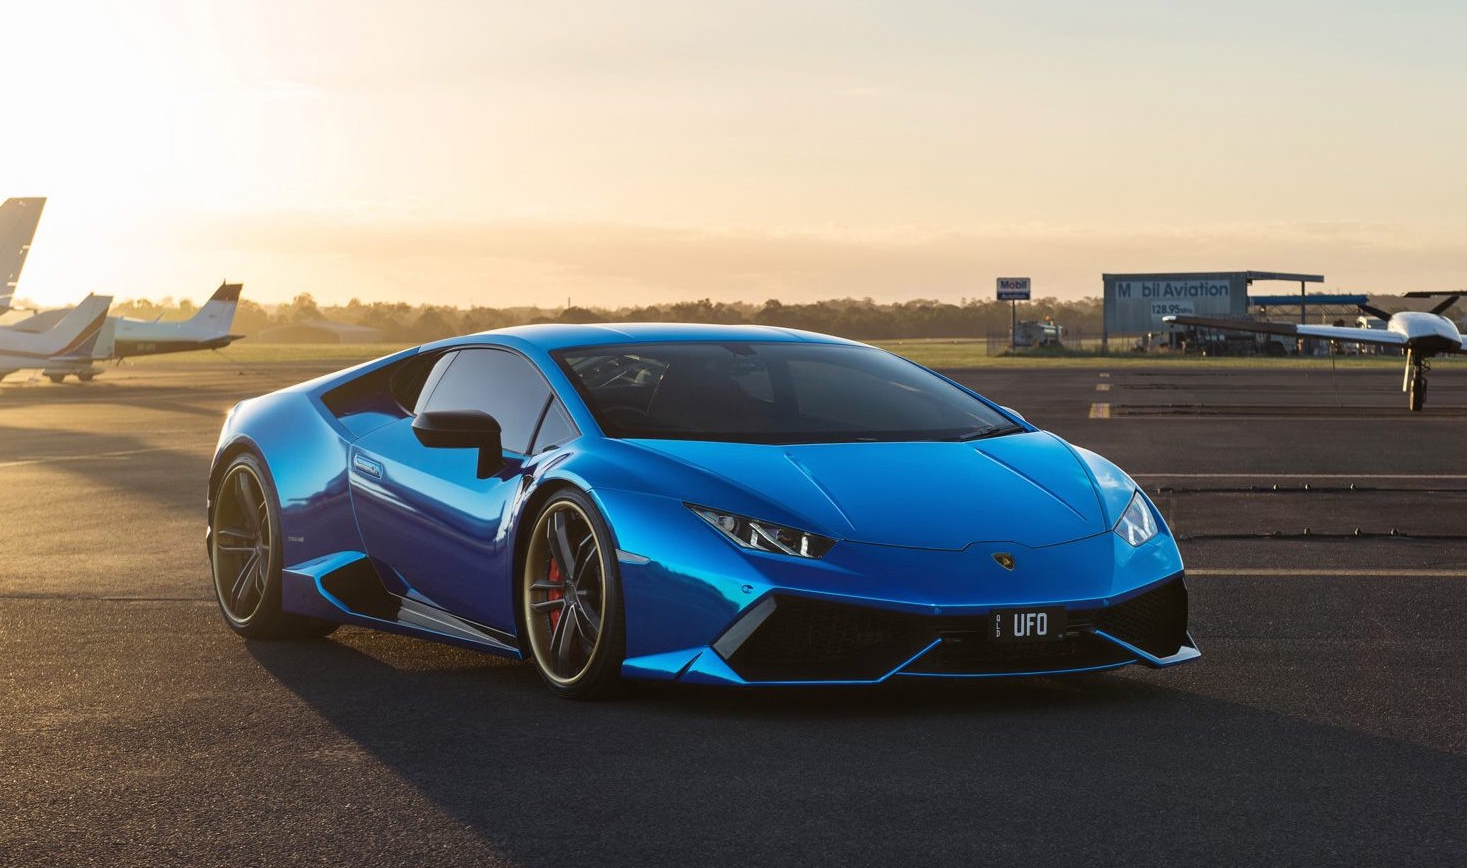 2016 Lamborghini Huracan Customed By Sunus Motorsports on Pretty Home Exterior